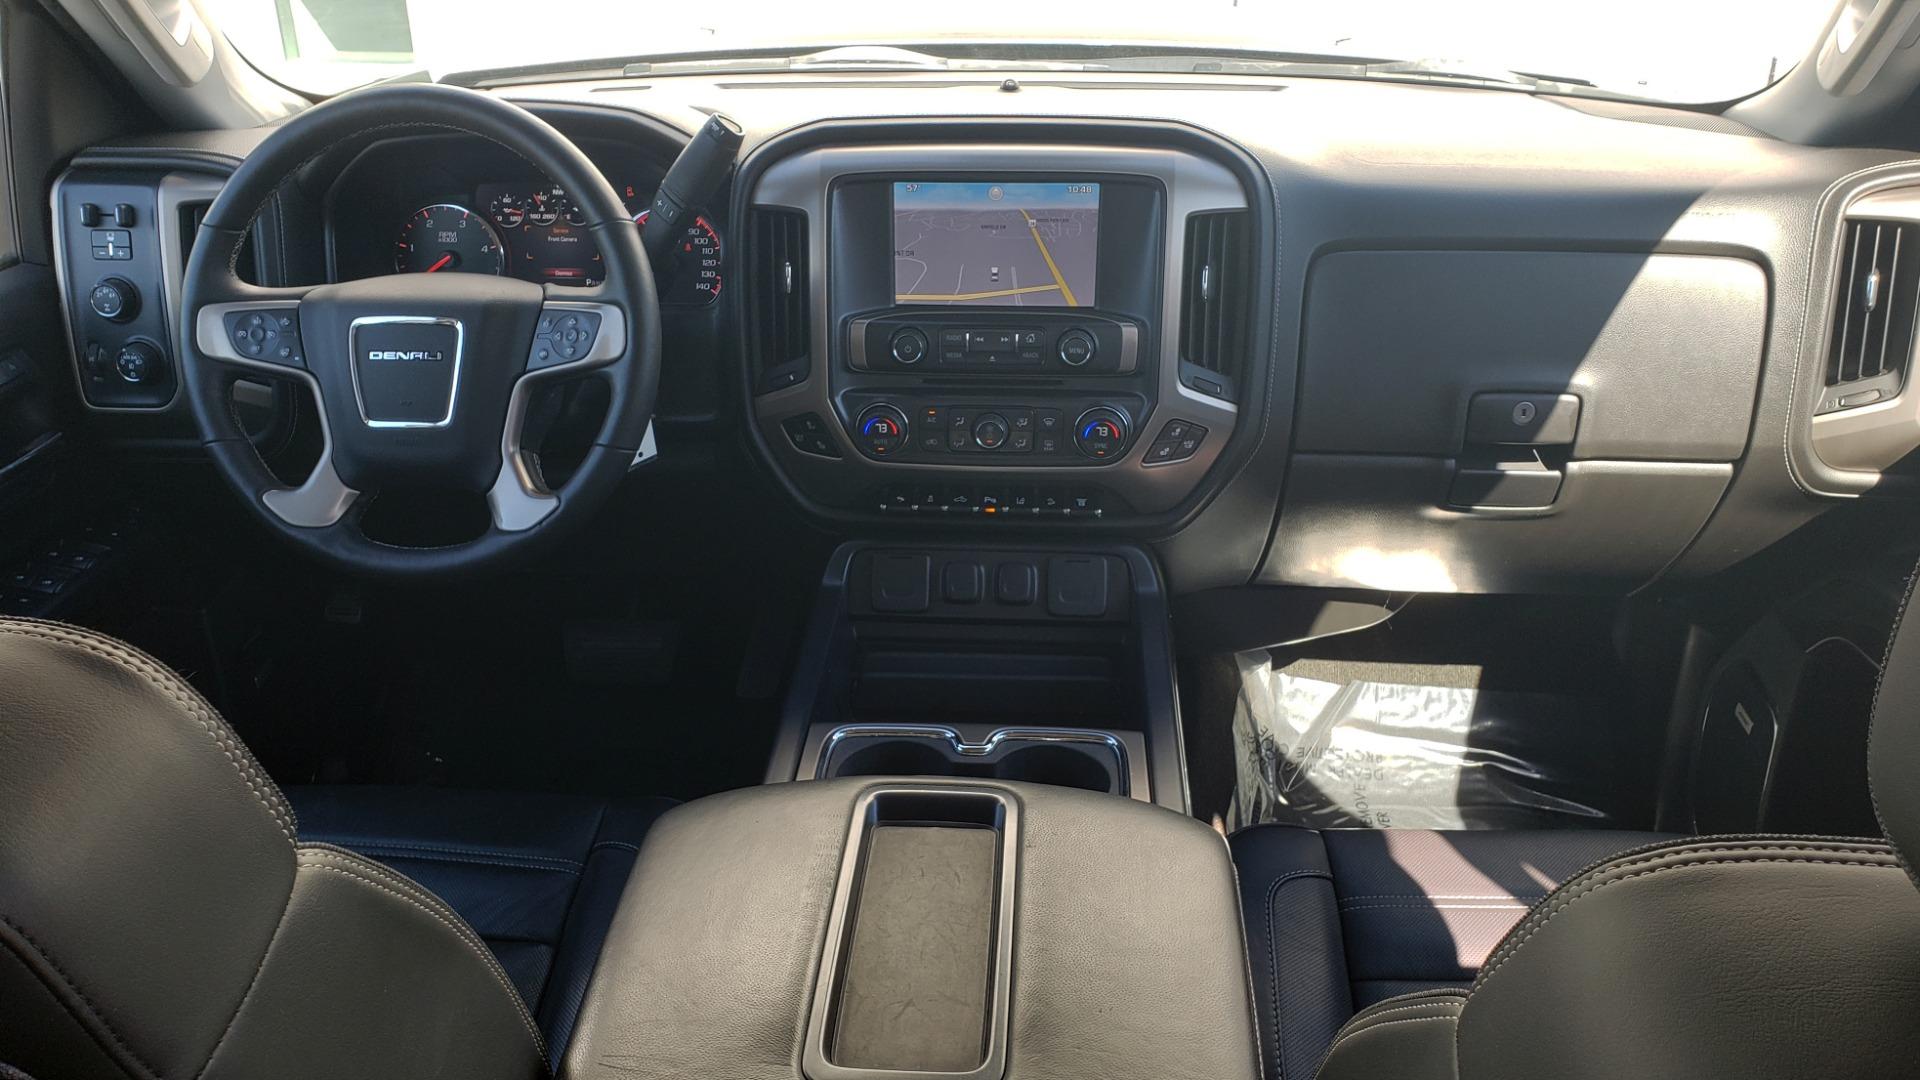 Used 2015 GMC SIERRA 2500HD DENALI 4WD CREWCAB / 6.6L DURAMAX / 6-SPD AUTO / NAV / BOSE for sale $50,995 at Formula Imports in Charlotte NC 28227 86